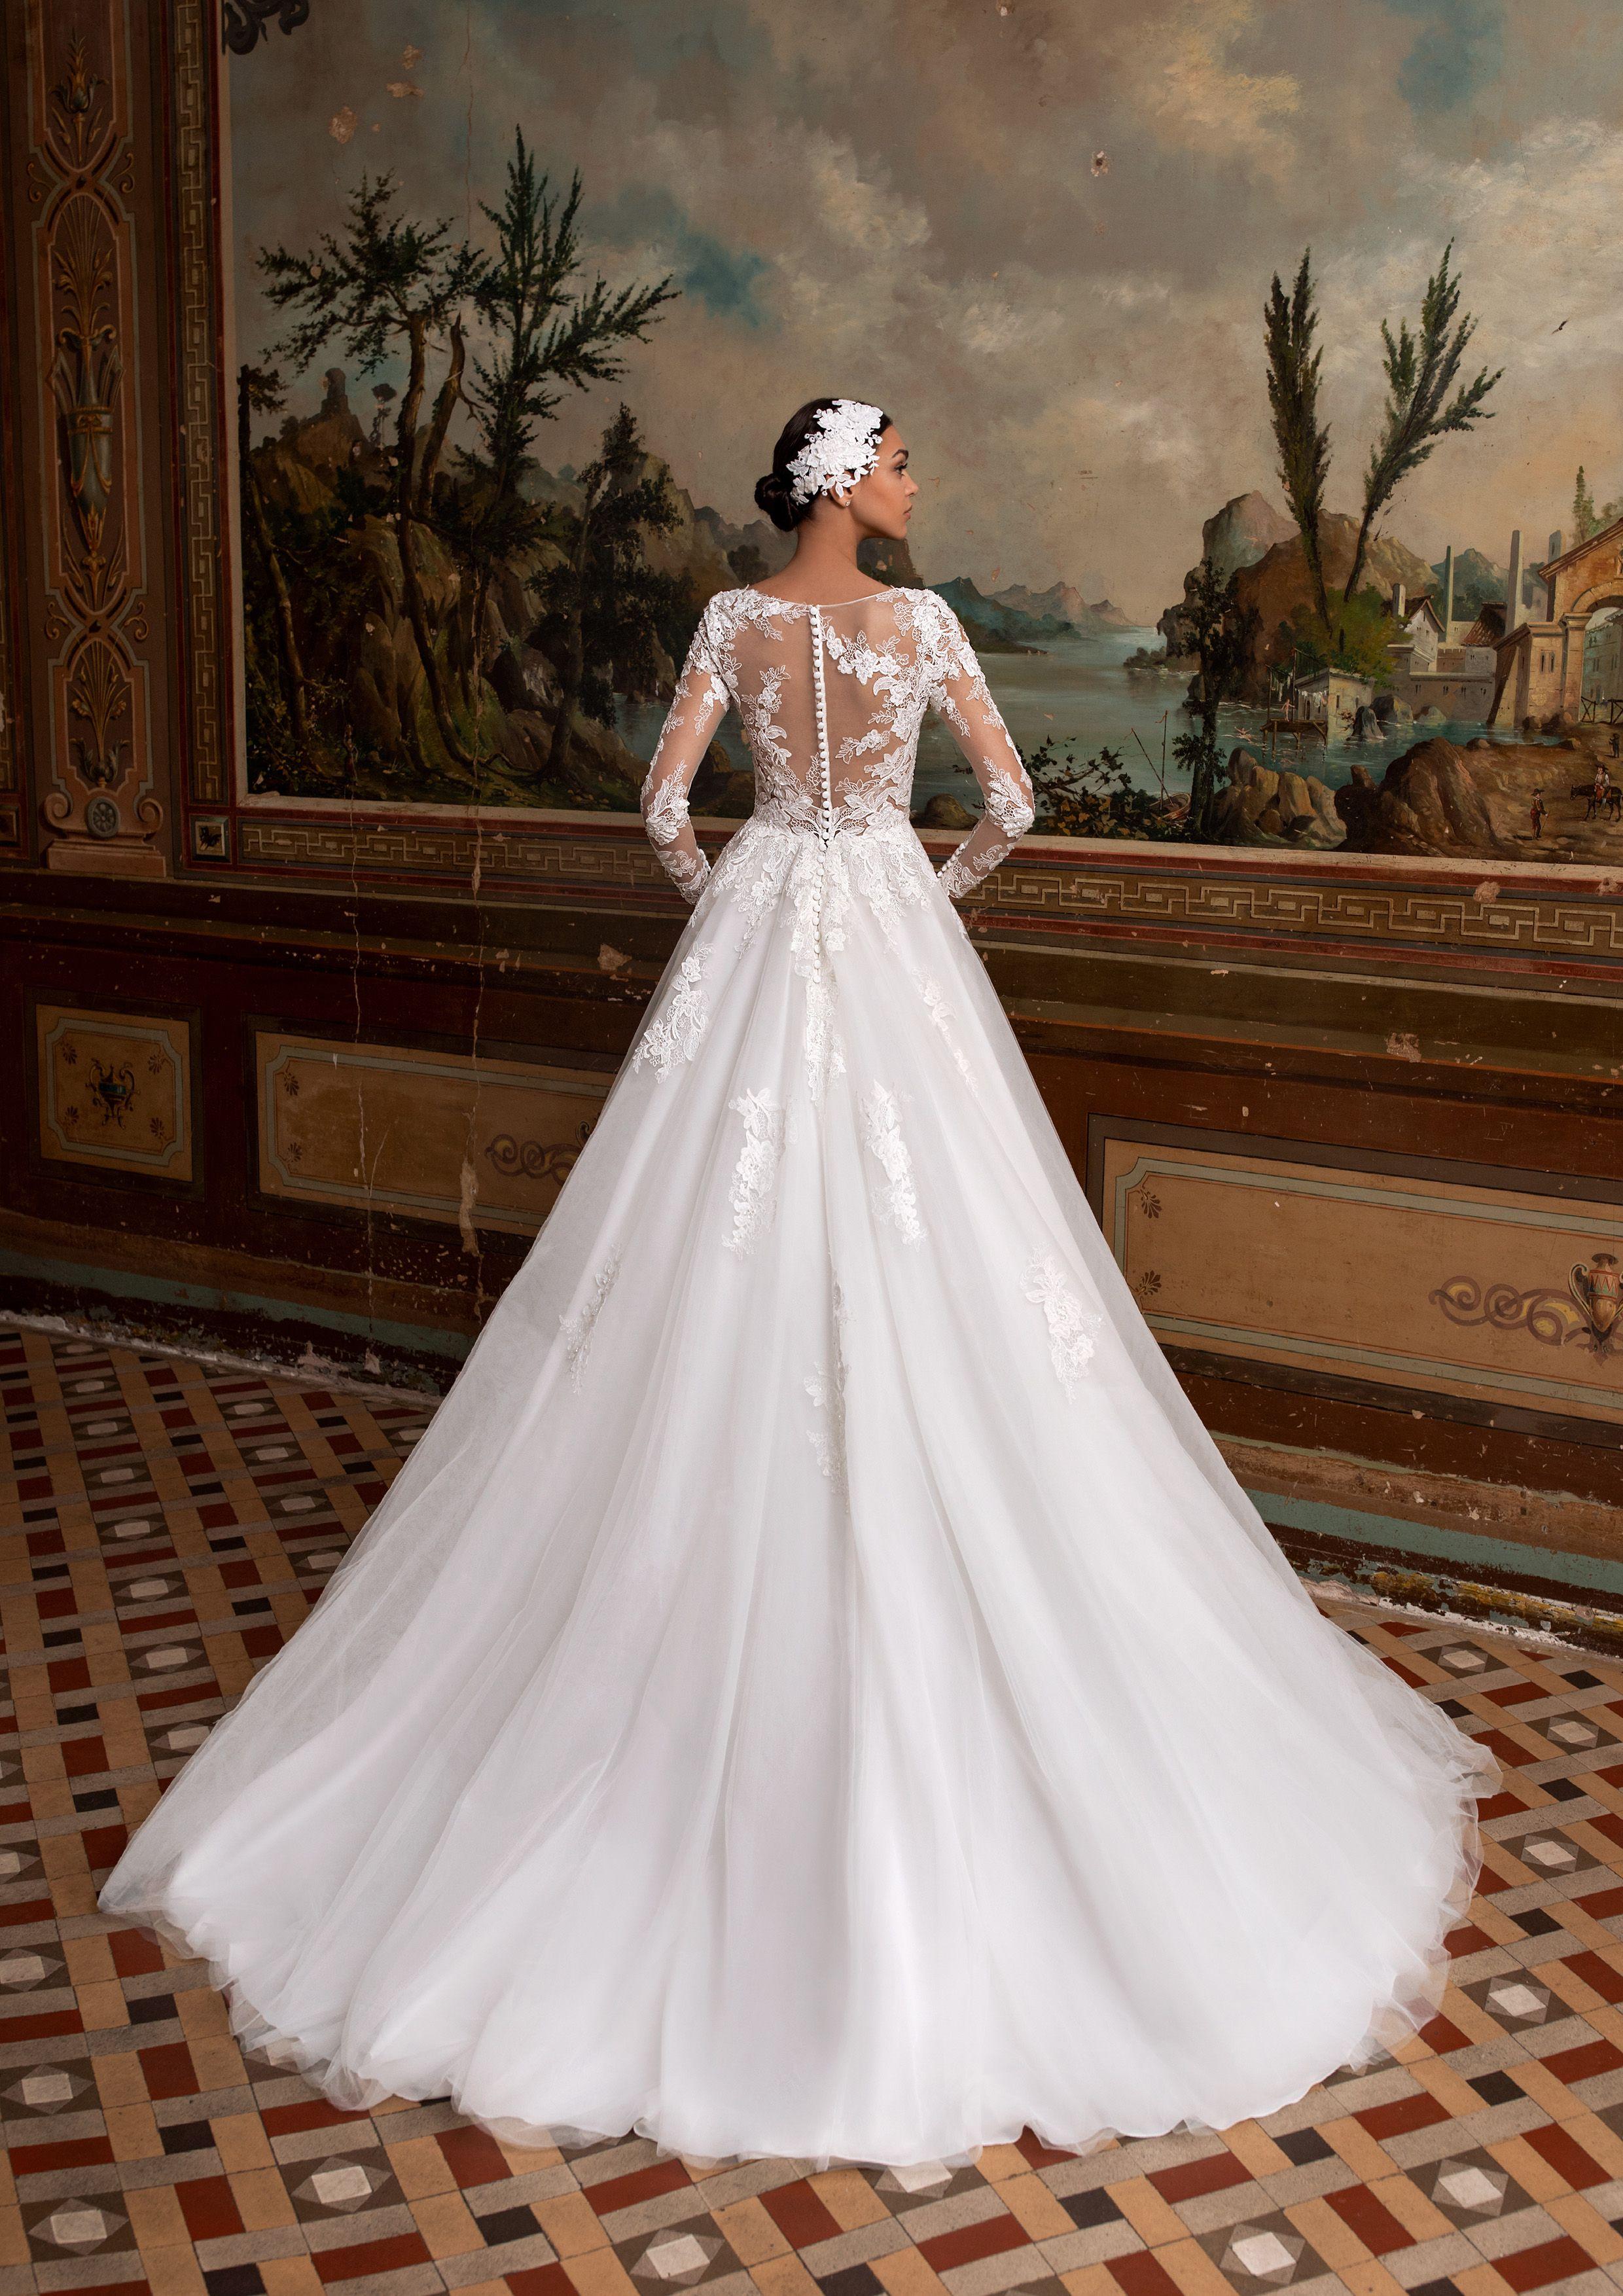 Royal Wedding Inspiration Wedding Dress Long Sleeve Pronovias Wedding Dress Wedding Dresses [ jpg ]